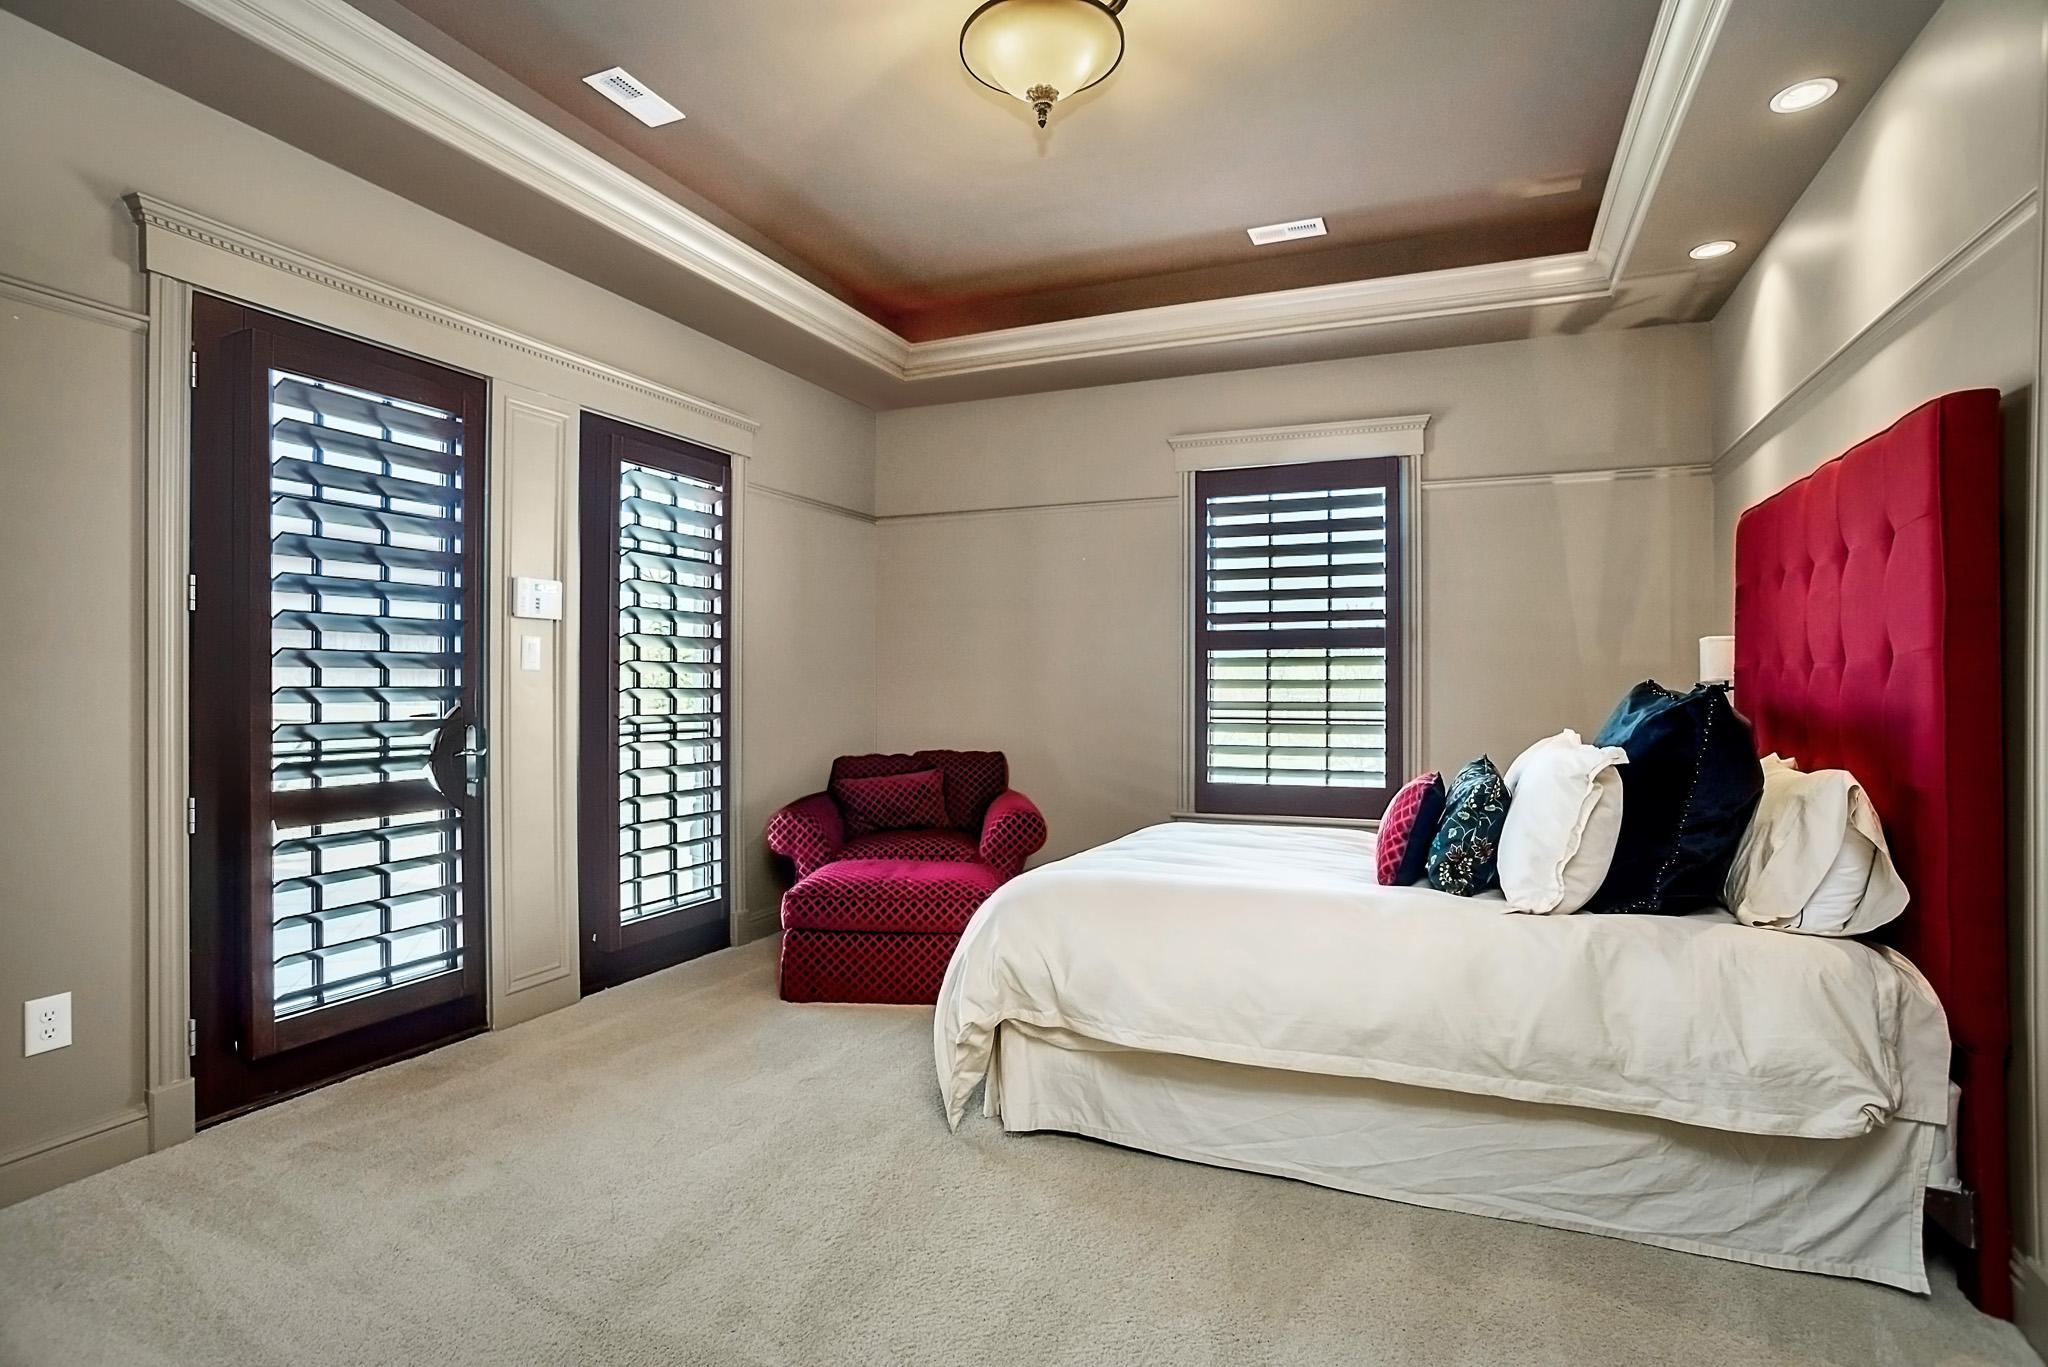 41-Bedroom 4.jpg